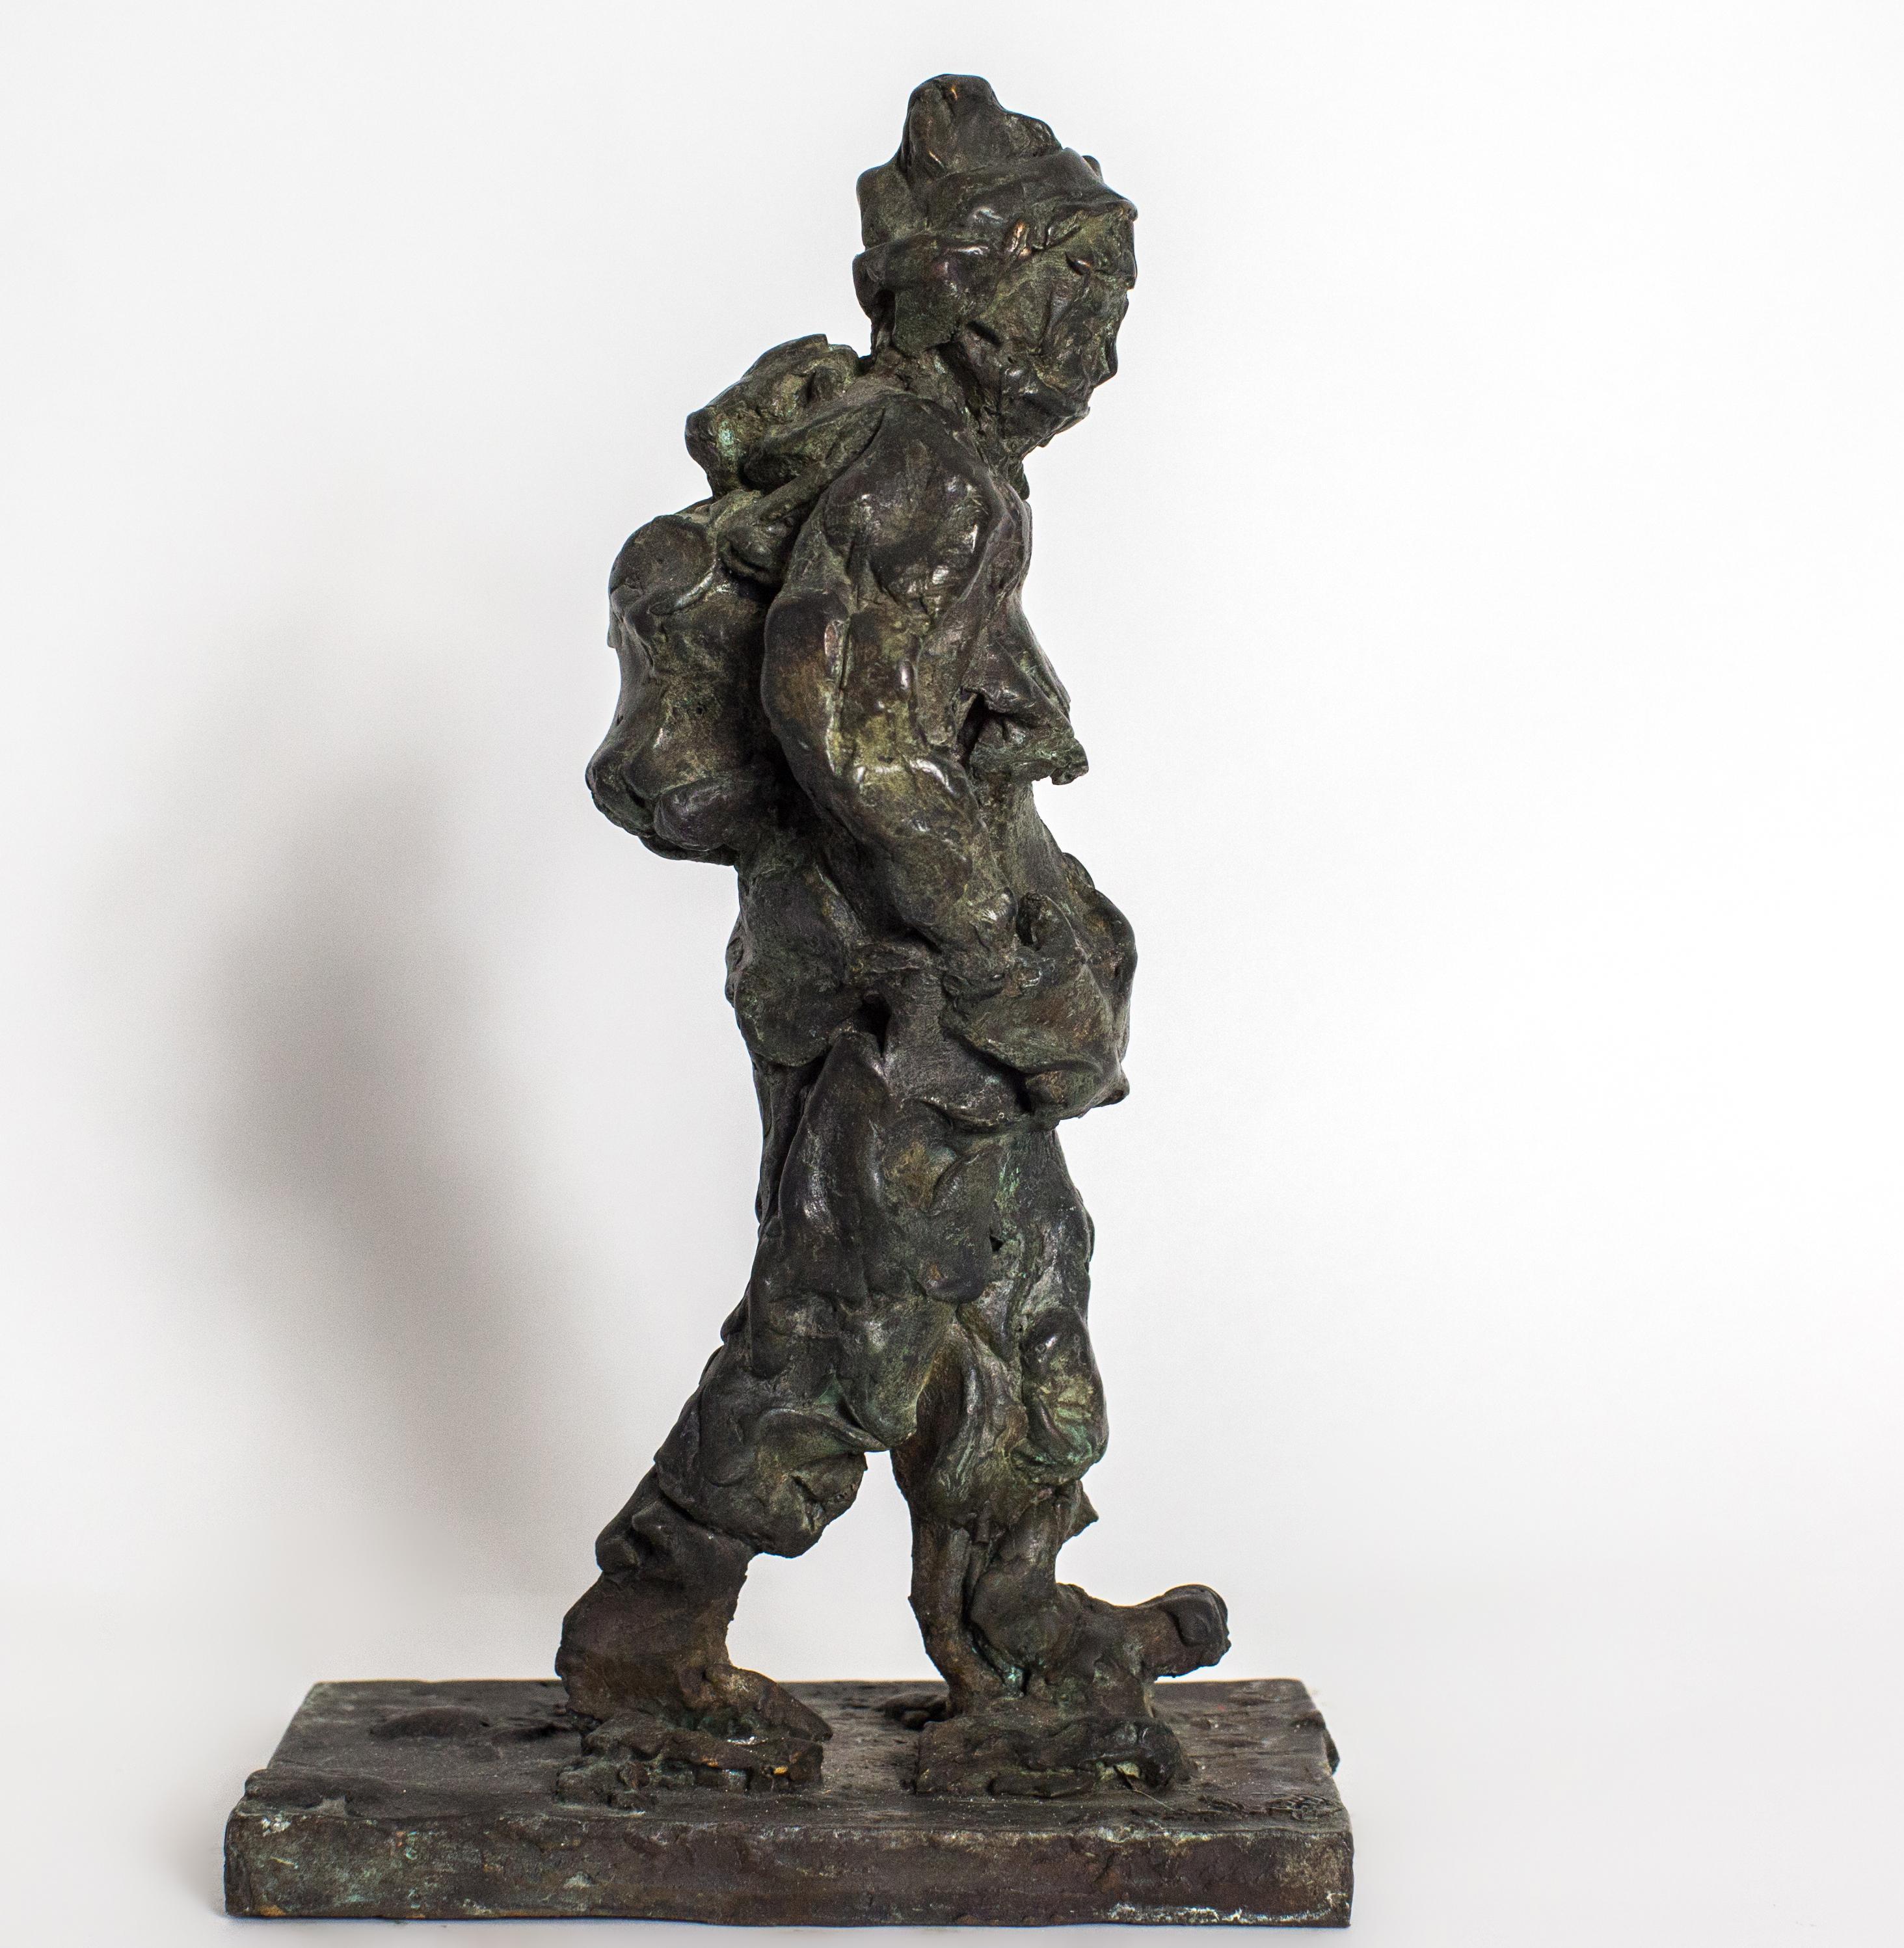 Russian Contemporary Sculpture by Alexander Sviyazov - Schoolchild